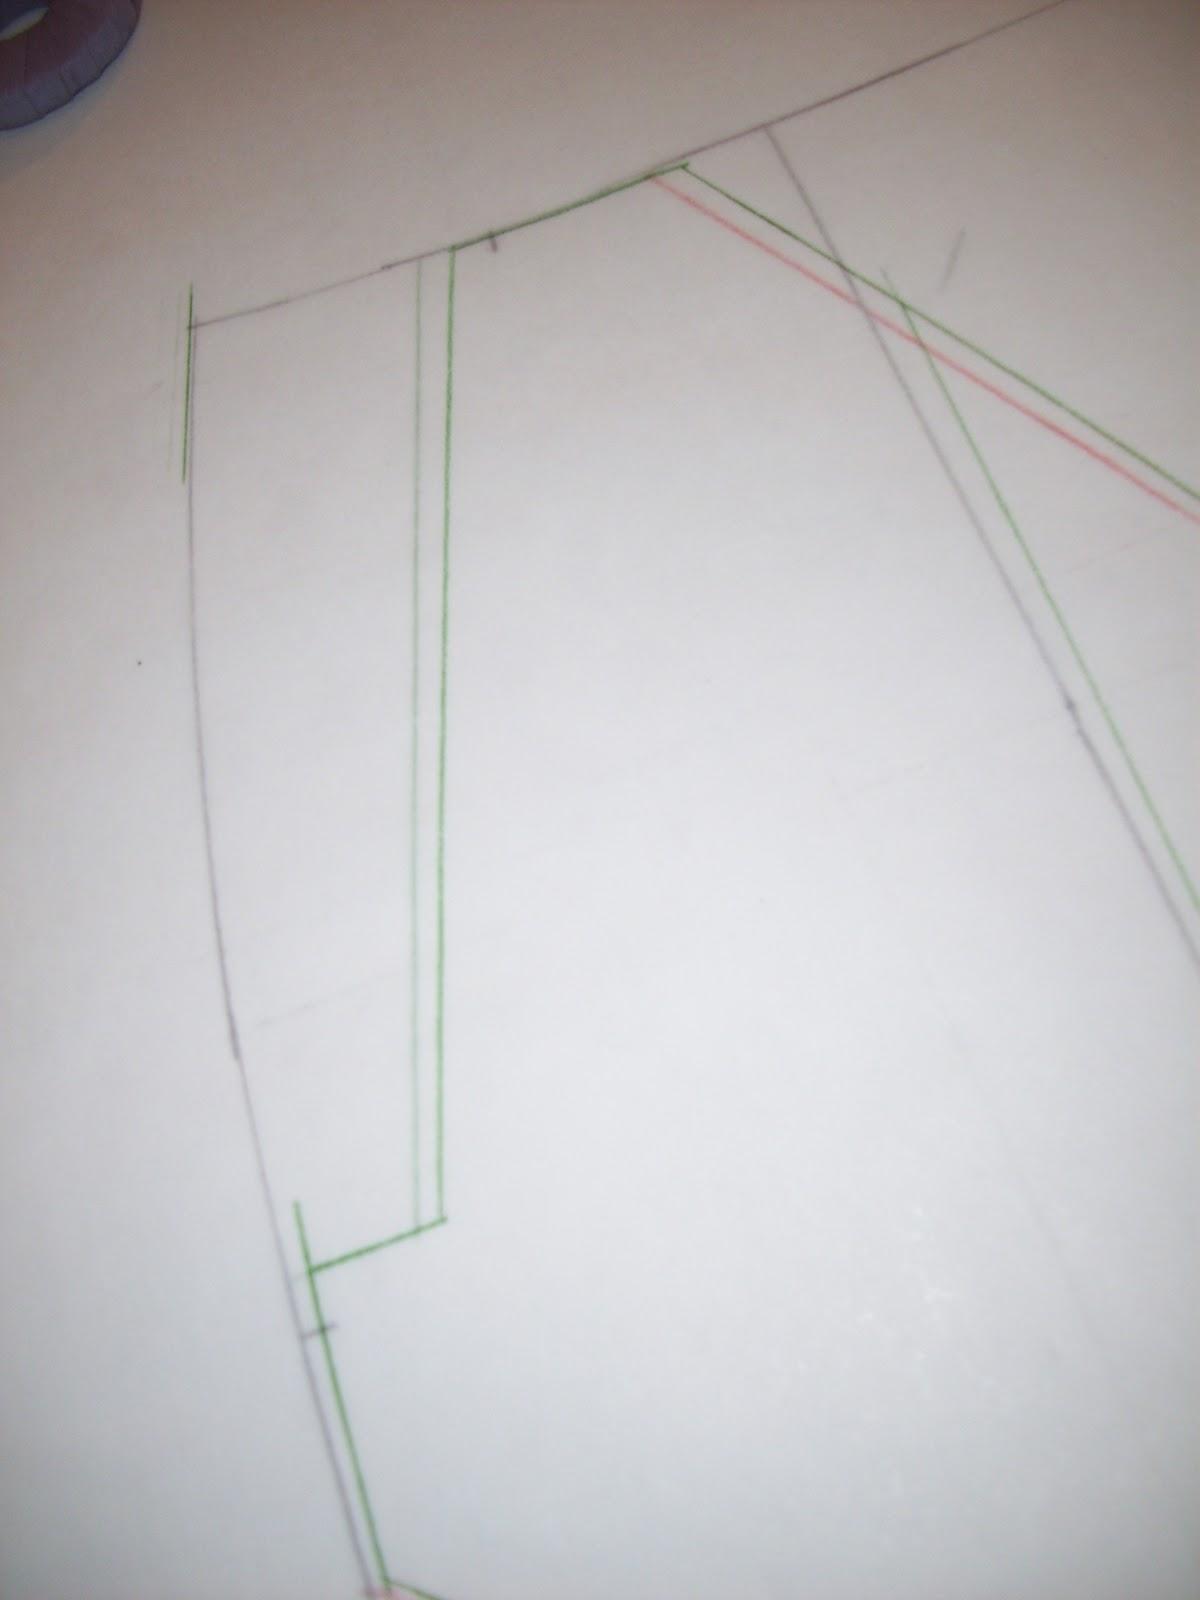 http://1.bp.blogspot.com/-a3fbspGhAEM/TrB-8z1aflI/AAAAAAAADFg/cydZZAg1ViY/s1600/Pivoted+pocket+lining.jpg